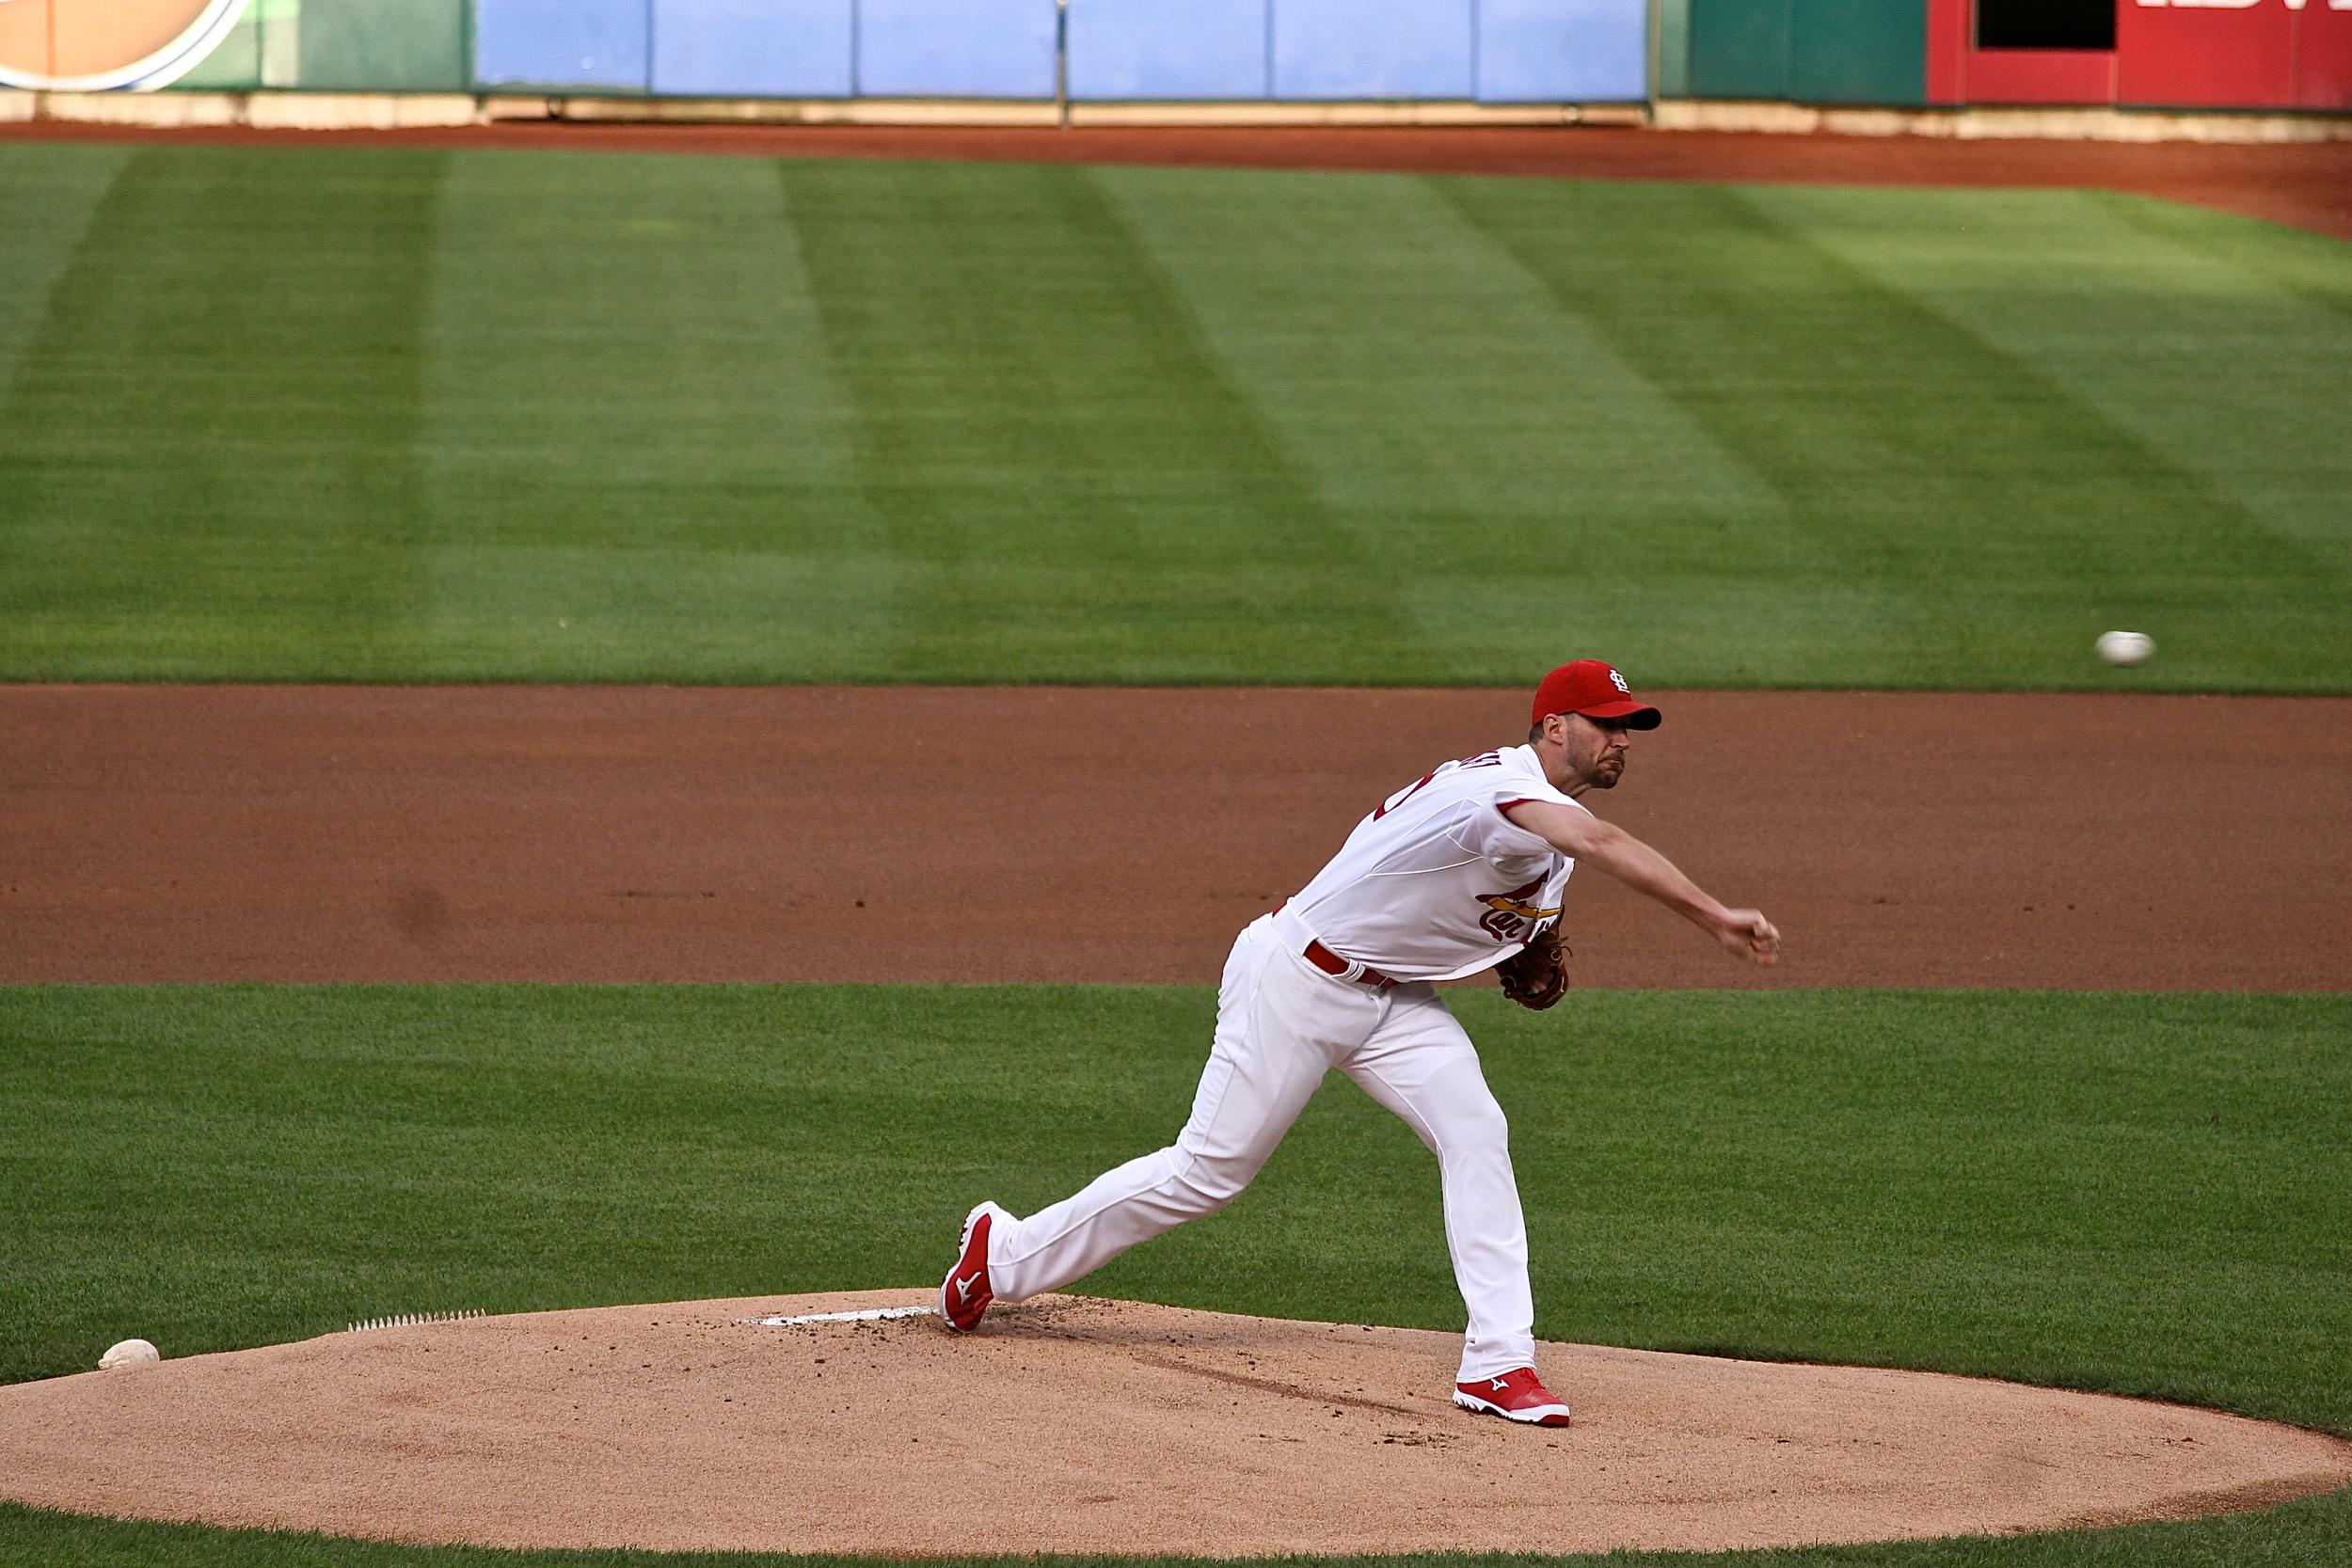 Wainwright roughed up